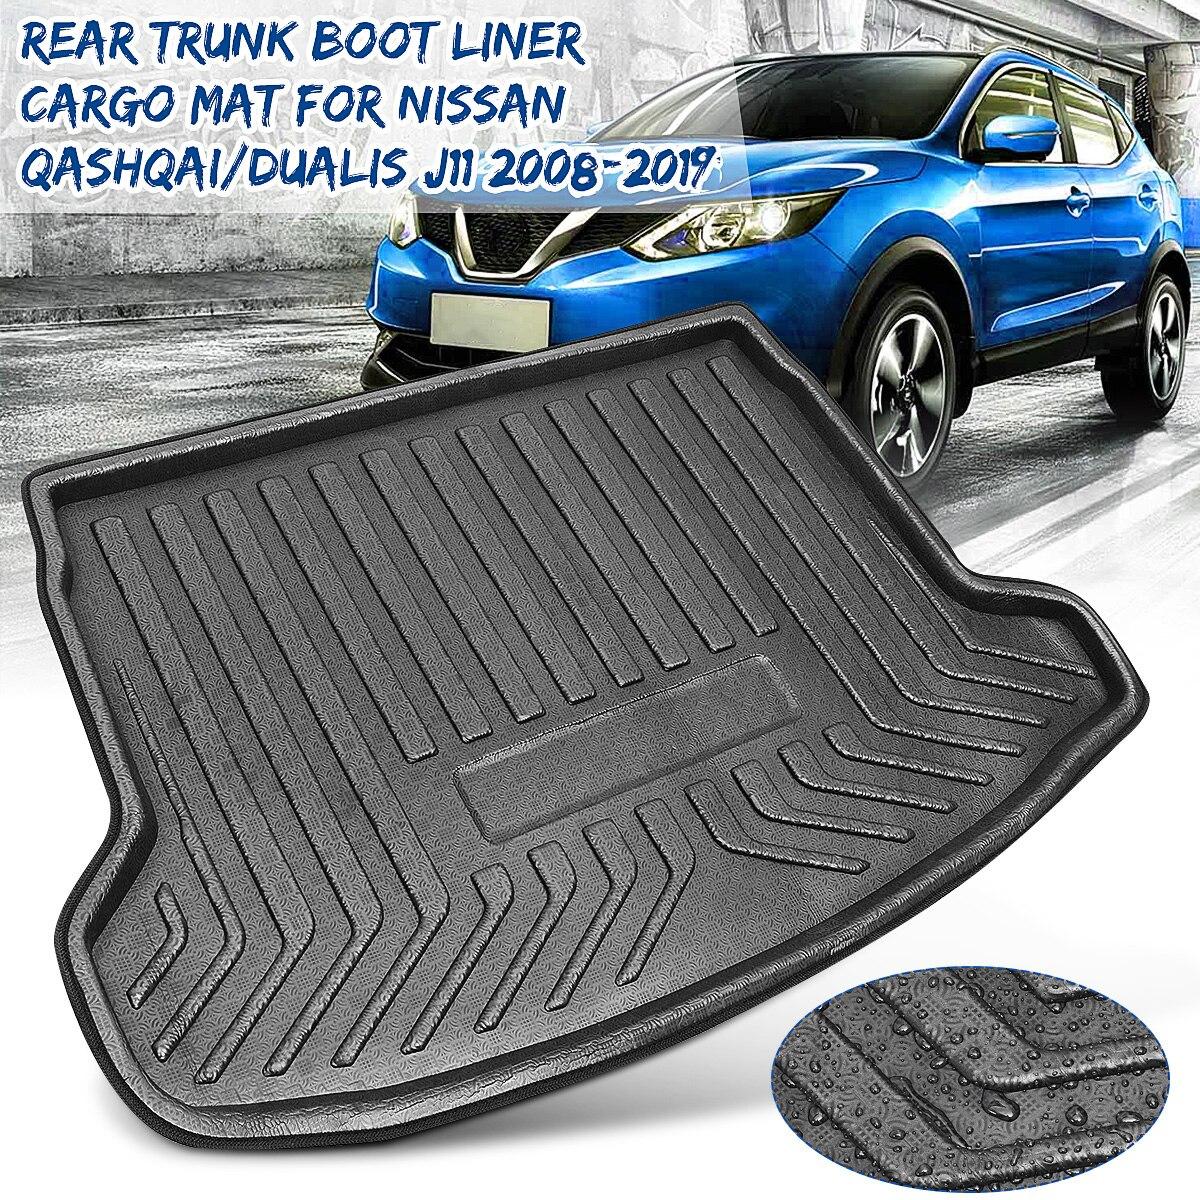 Rear Cargo Boot Liner Trunk Floor Mat Tray Carpet Mats Mud Kick For Nissan Qashqai / for Dualis J11 2008 2009 2010 2011-2019